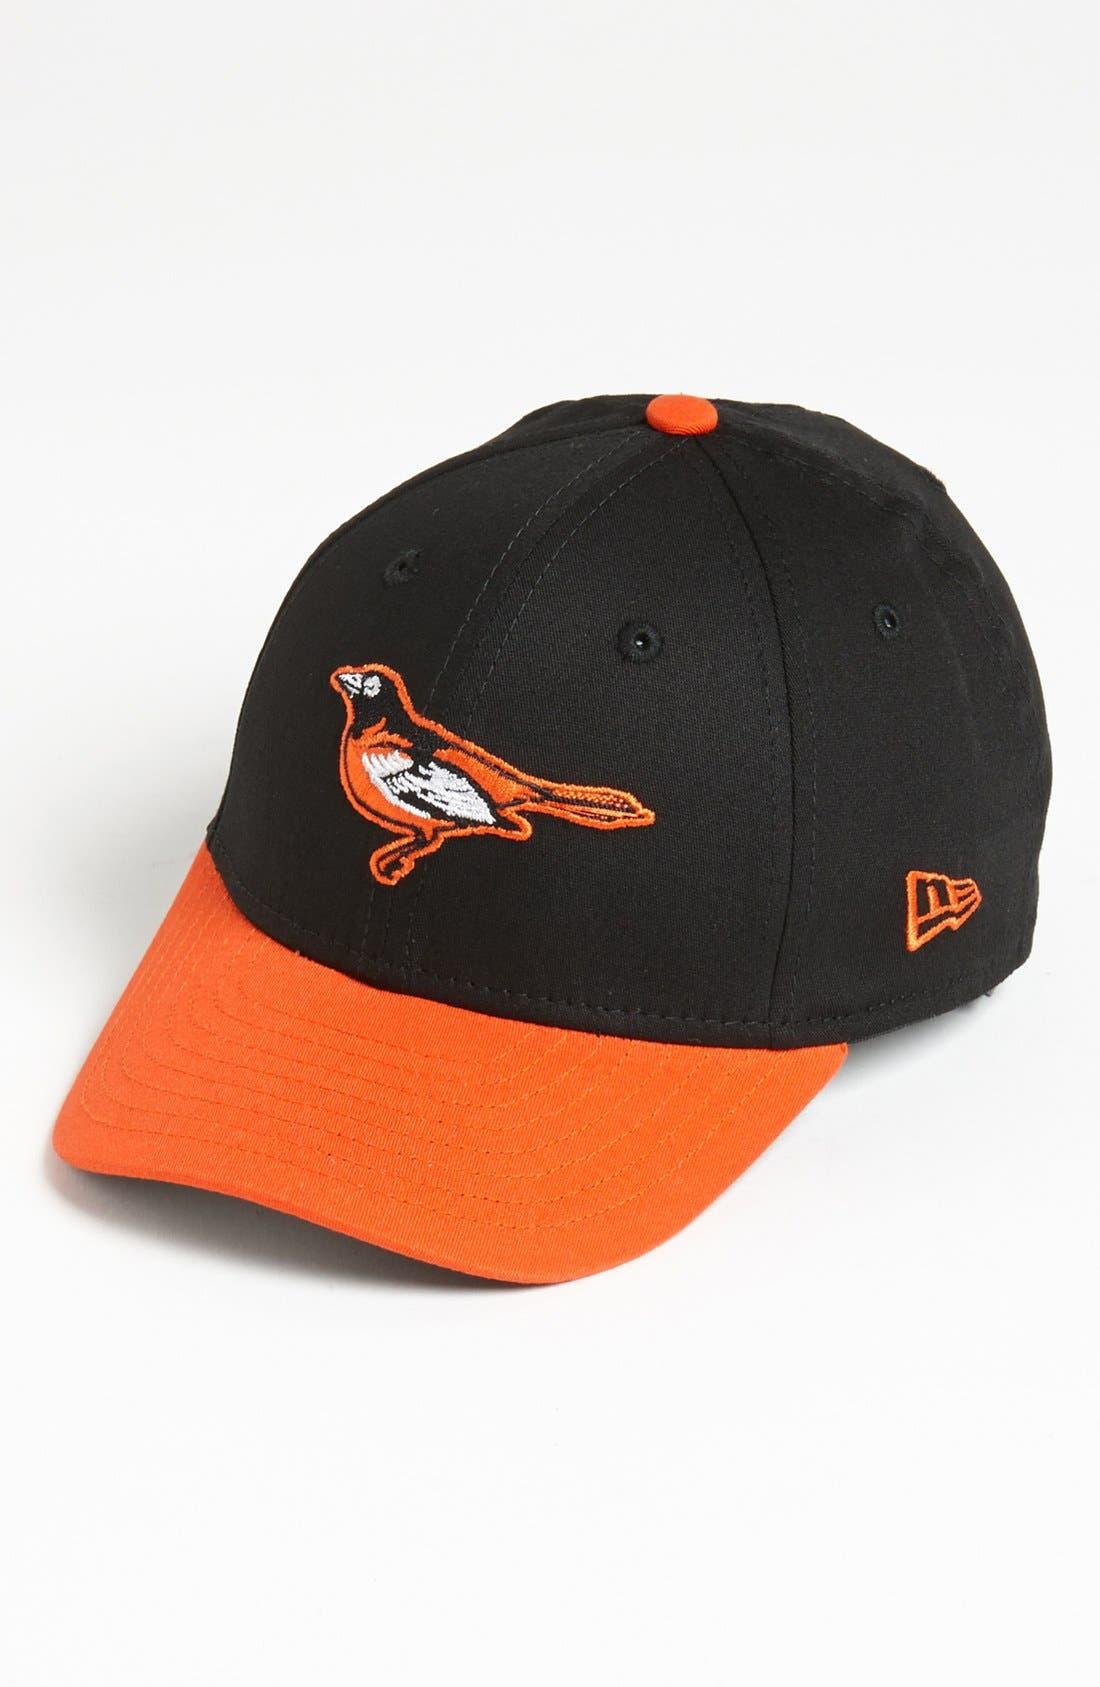 Alternate Image 1 Selected - New Era Cap 'Baltimore Orioles - Tie Breaker' Baseball Cap (Big Boys)